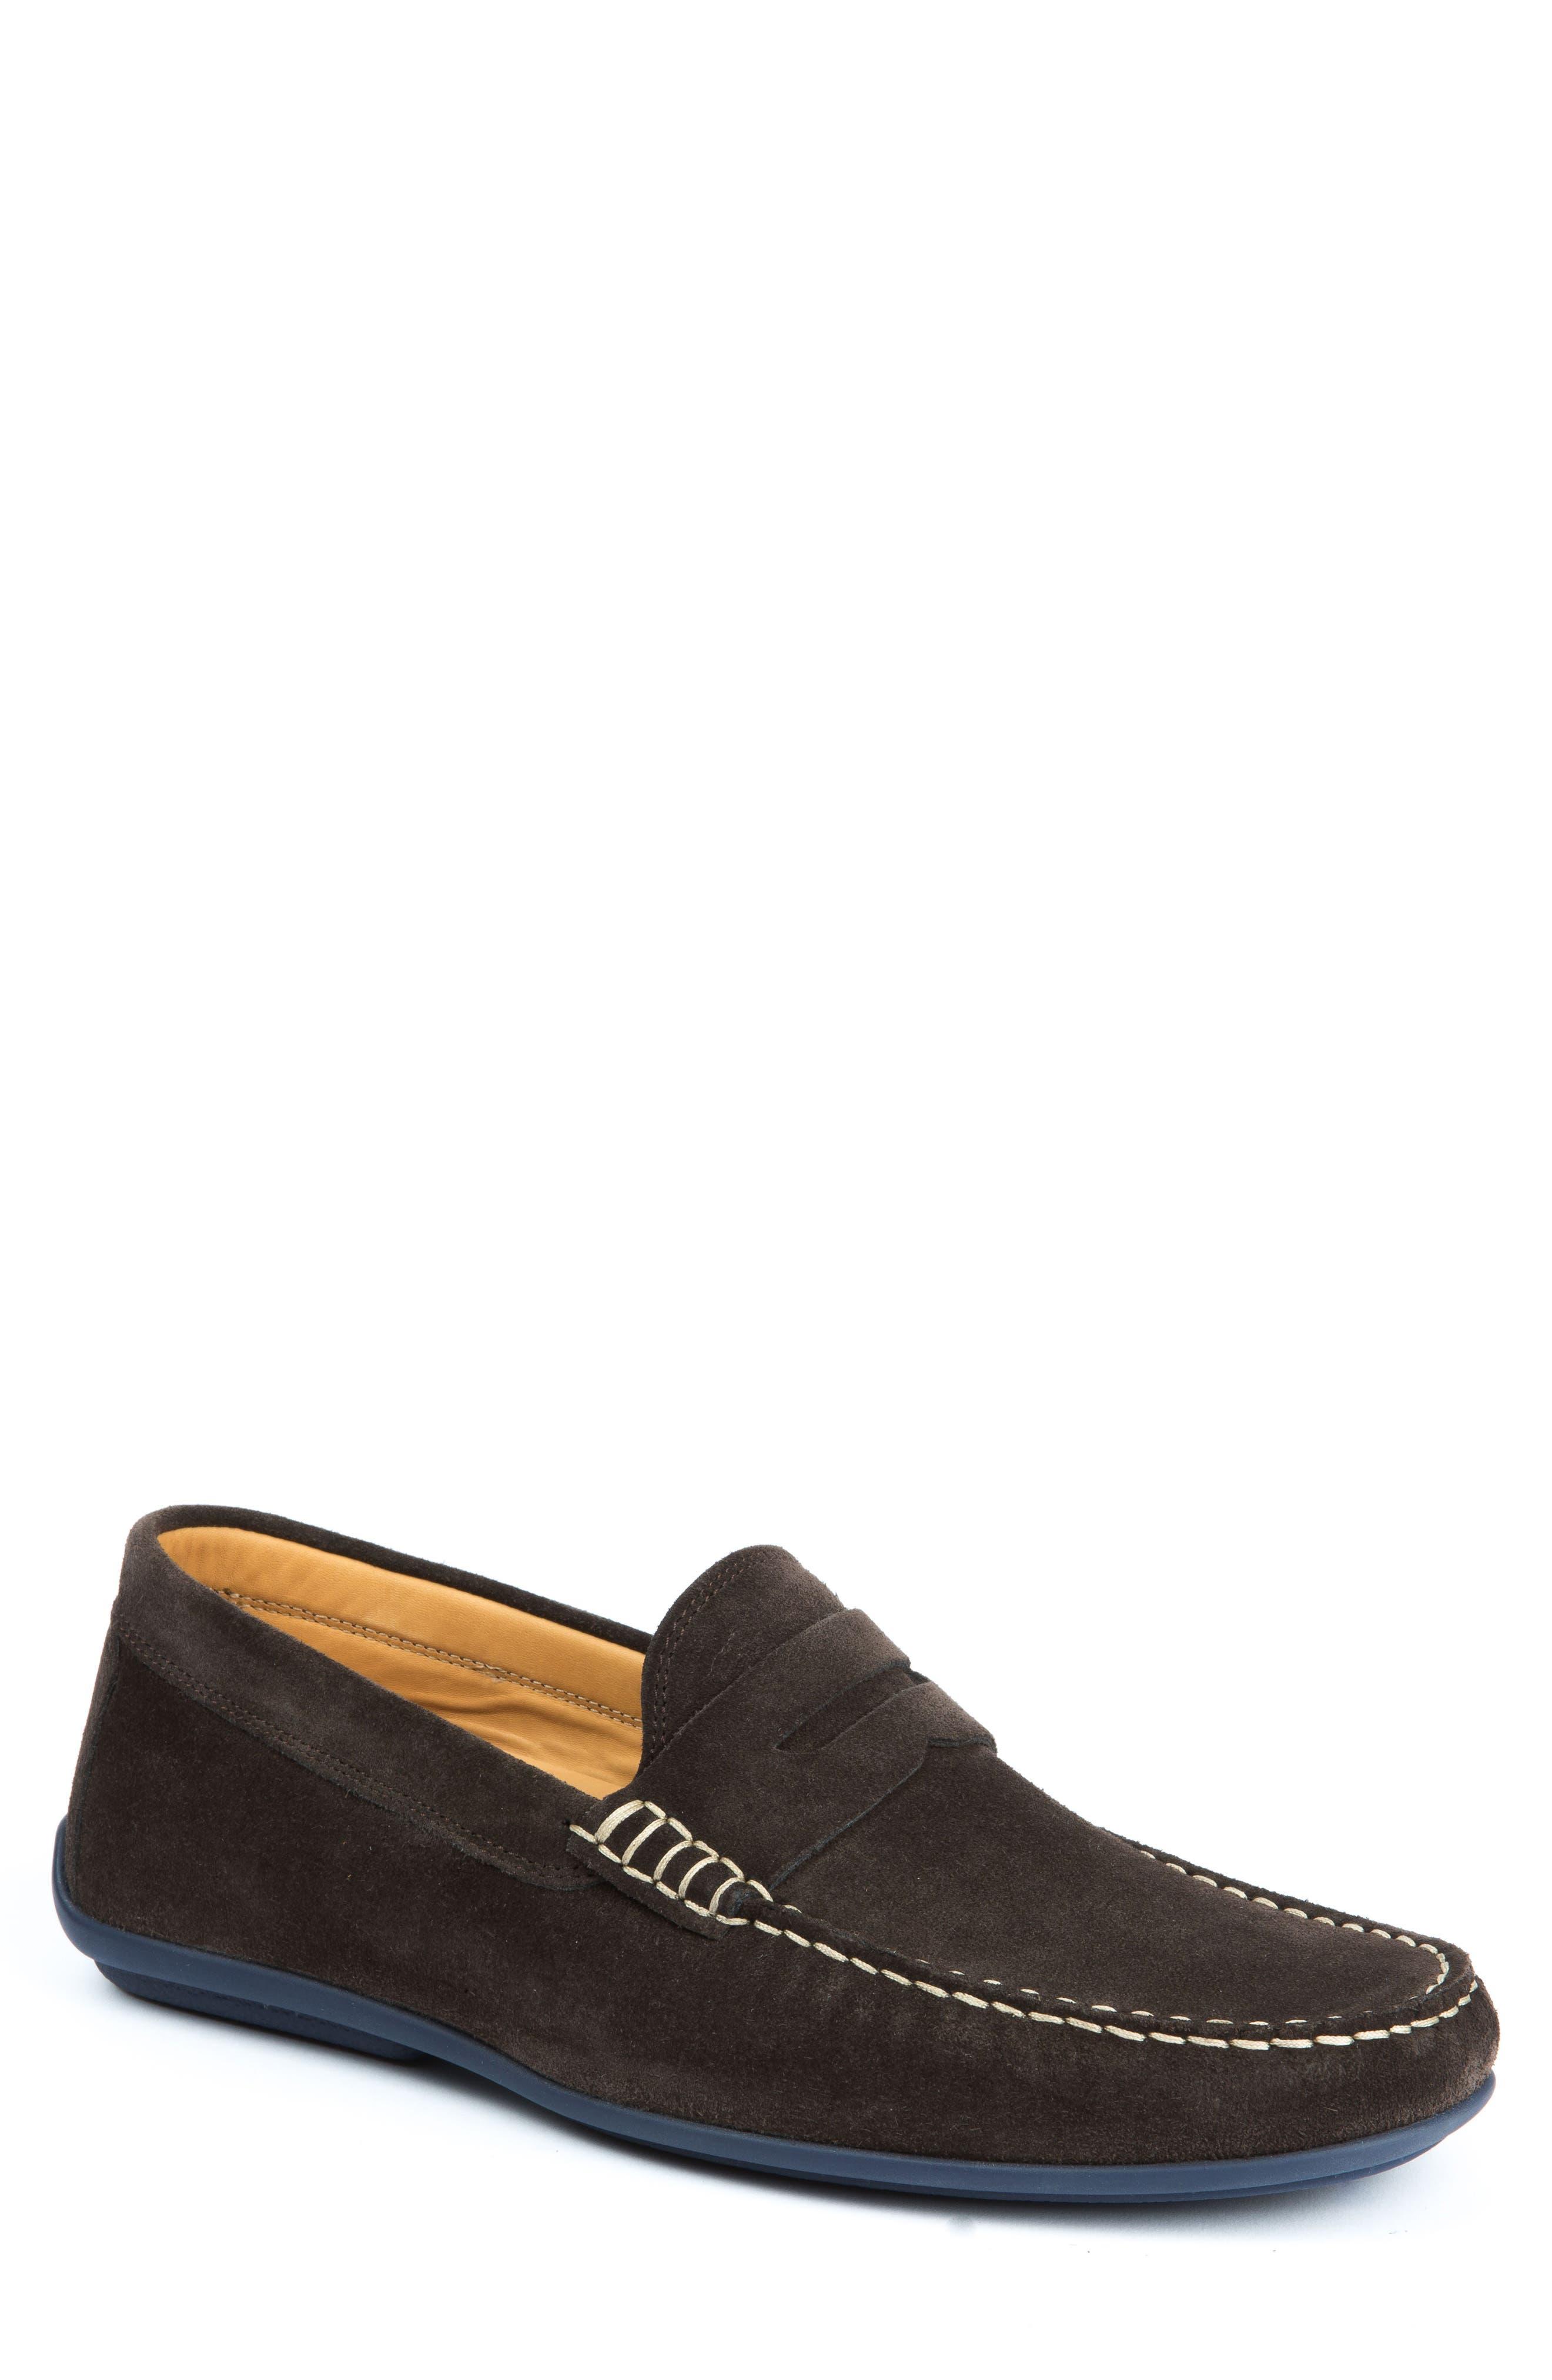 Alternate Image 1 Selected - Austen Heller Biltmores Driving Shoe (Men)